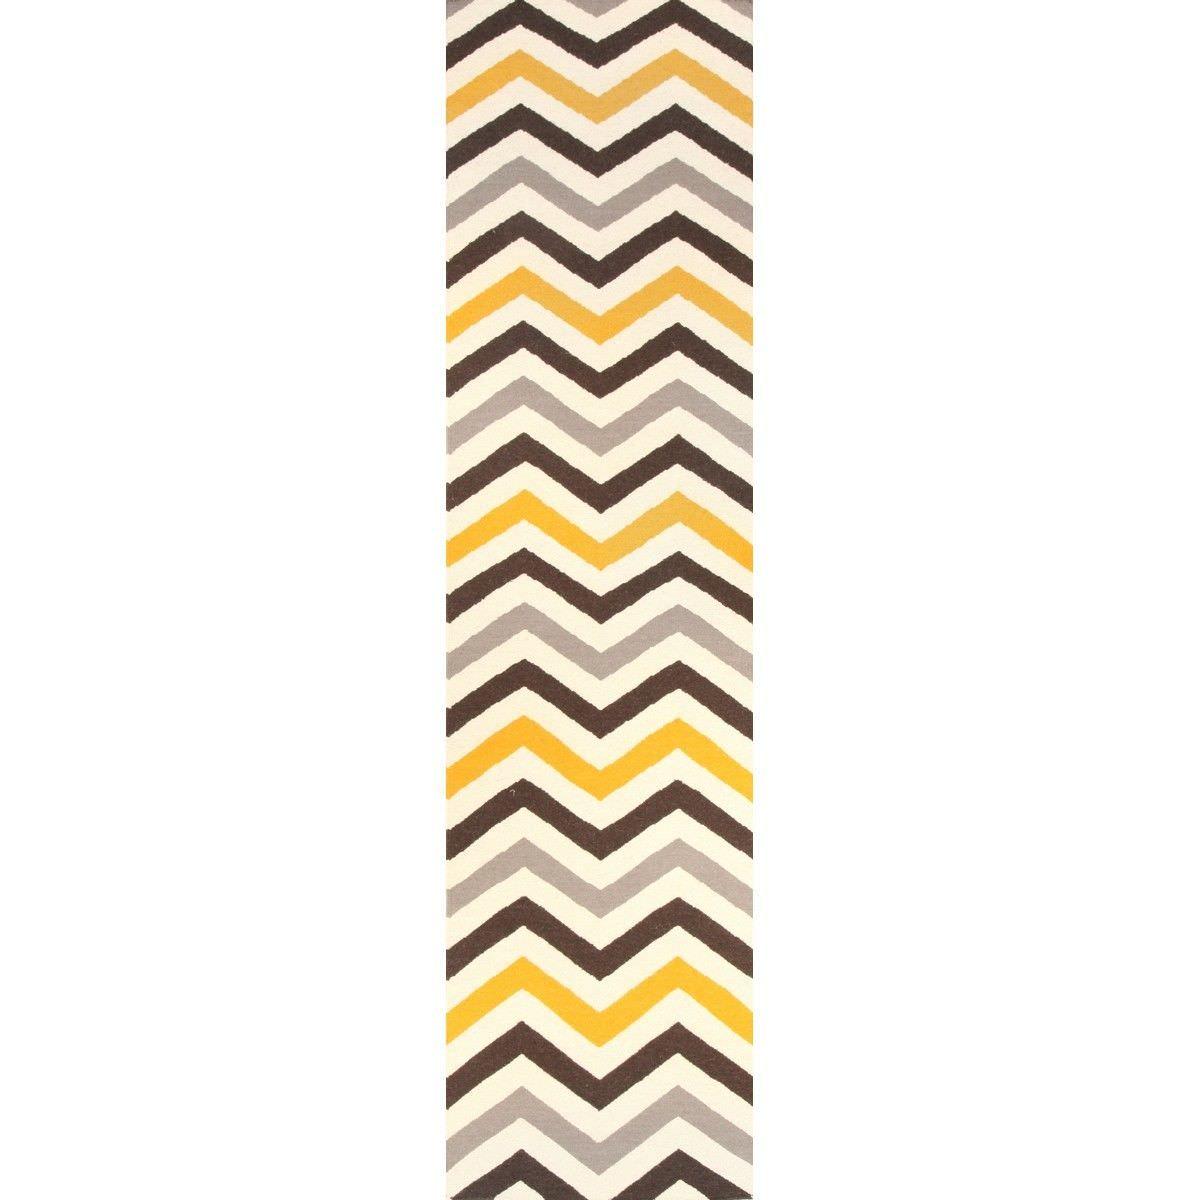 Nomad Chevron Flat Woven Wool Runner Rug, 400x80cm, Yellow / Brown